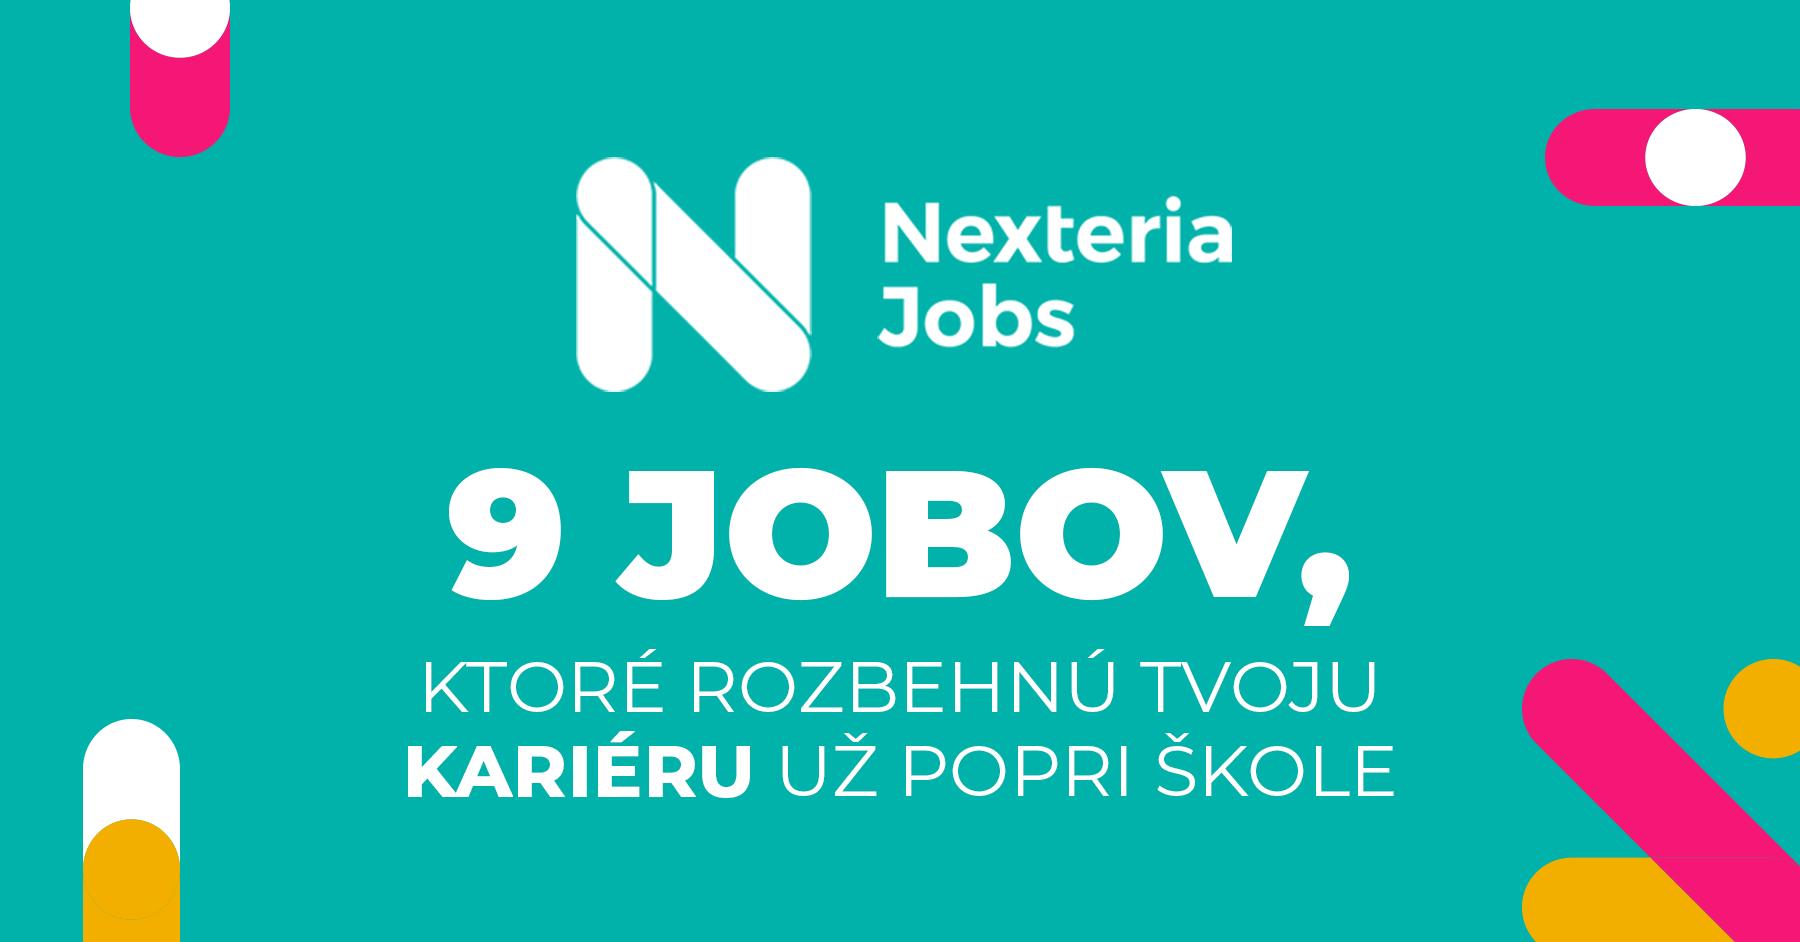 Nexteria Jobs